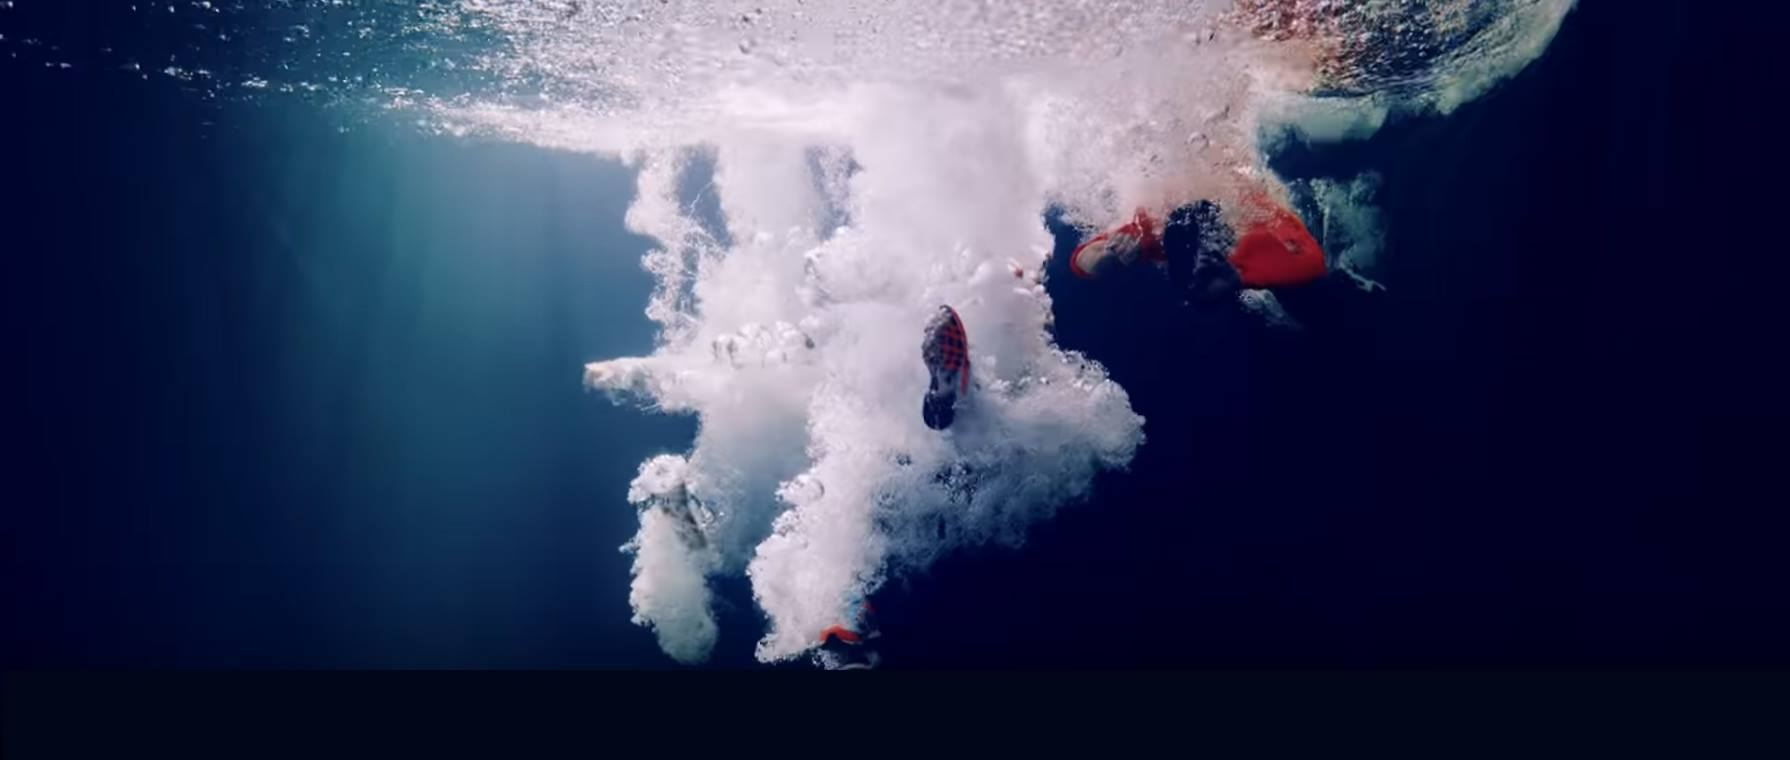 WANIMA 渚の泡沫 水中撮影 MV撮影|ジール撮影事業部